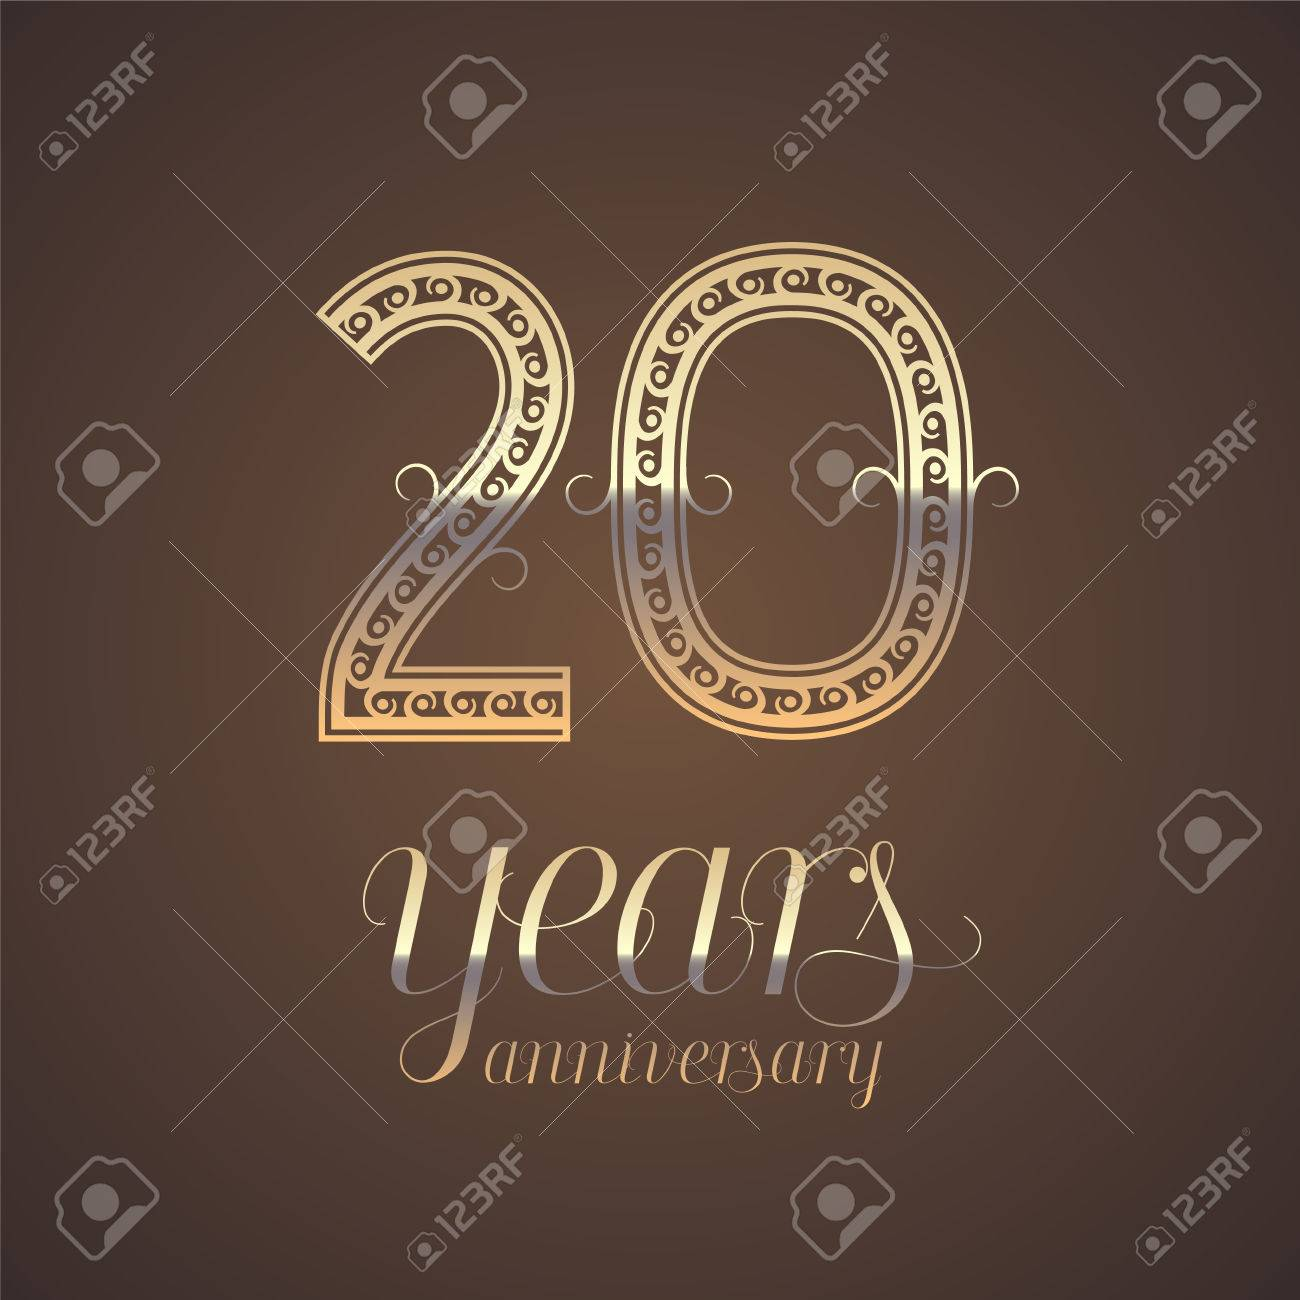 20 years anniversary vector icon symbol graphic design element 20 years anniversary vector icon symbol graphic design element with golden number for 20th kristyandbryce Choice Image